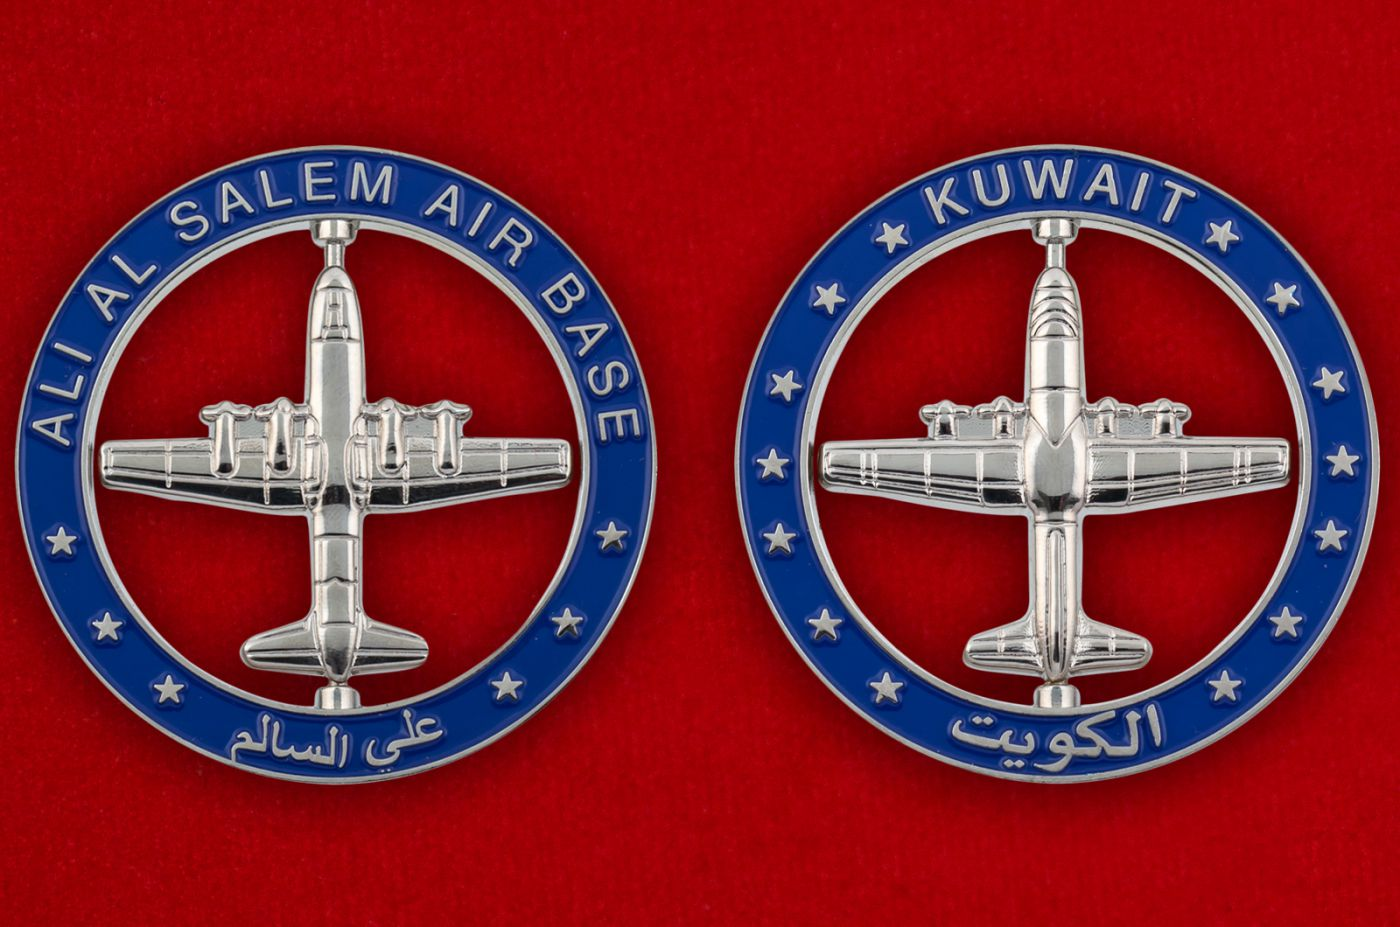 Челлендж коин авиабазы Али аль-Салем ВВС Кувейта - аверс и реверс